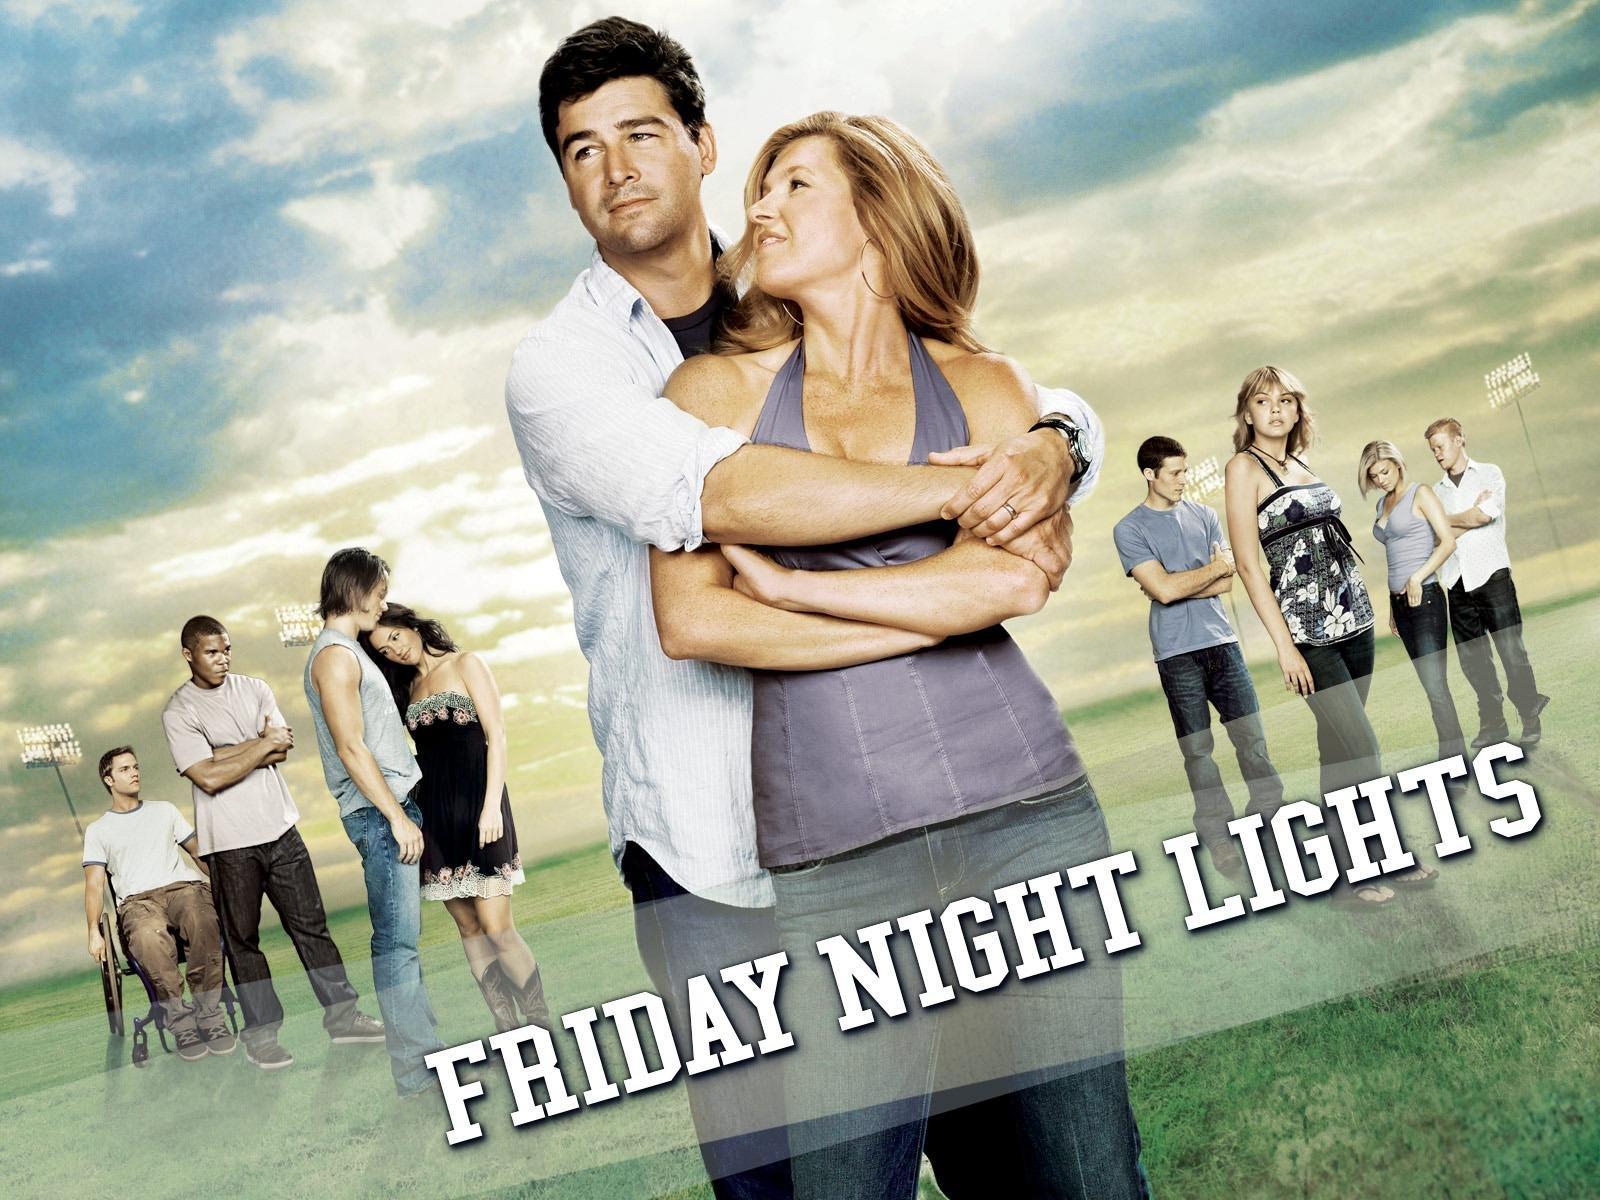 friday night lights season 1 online free